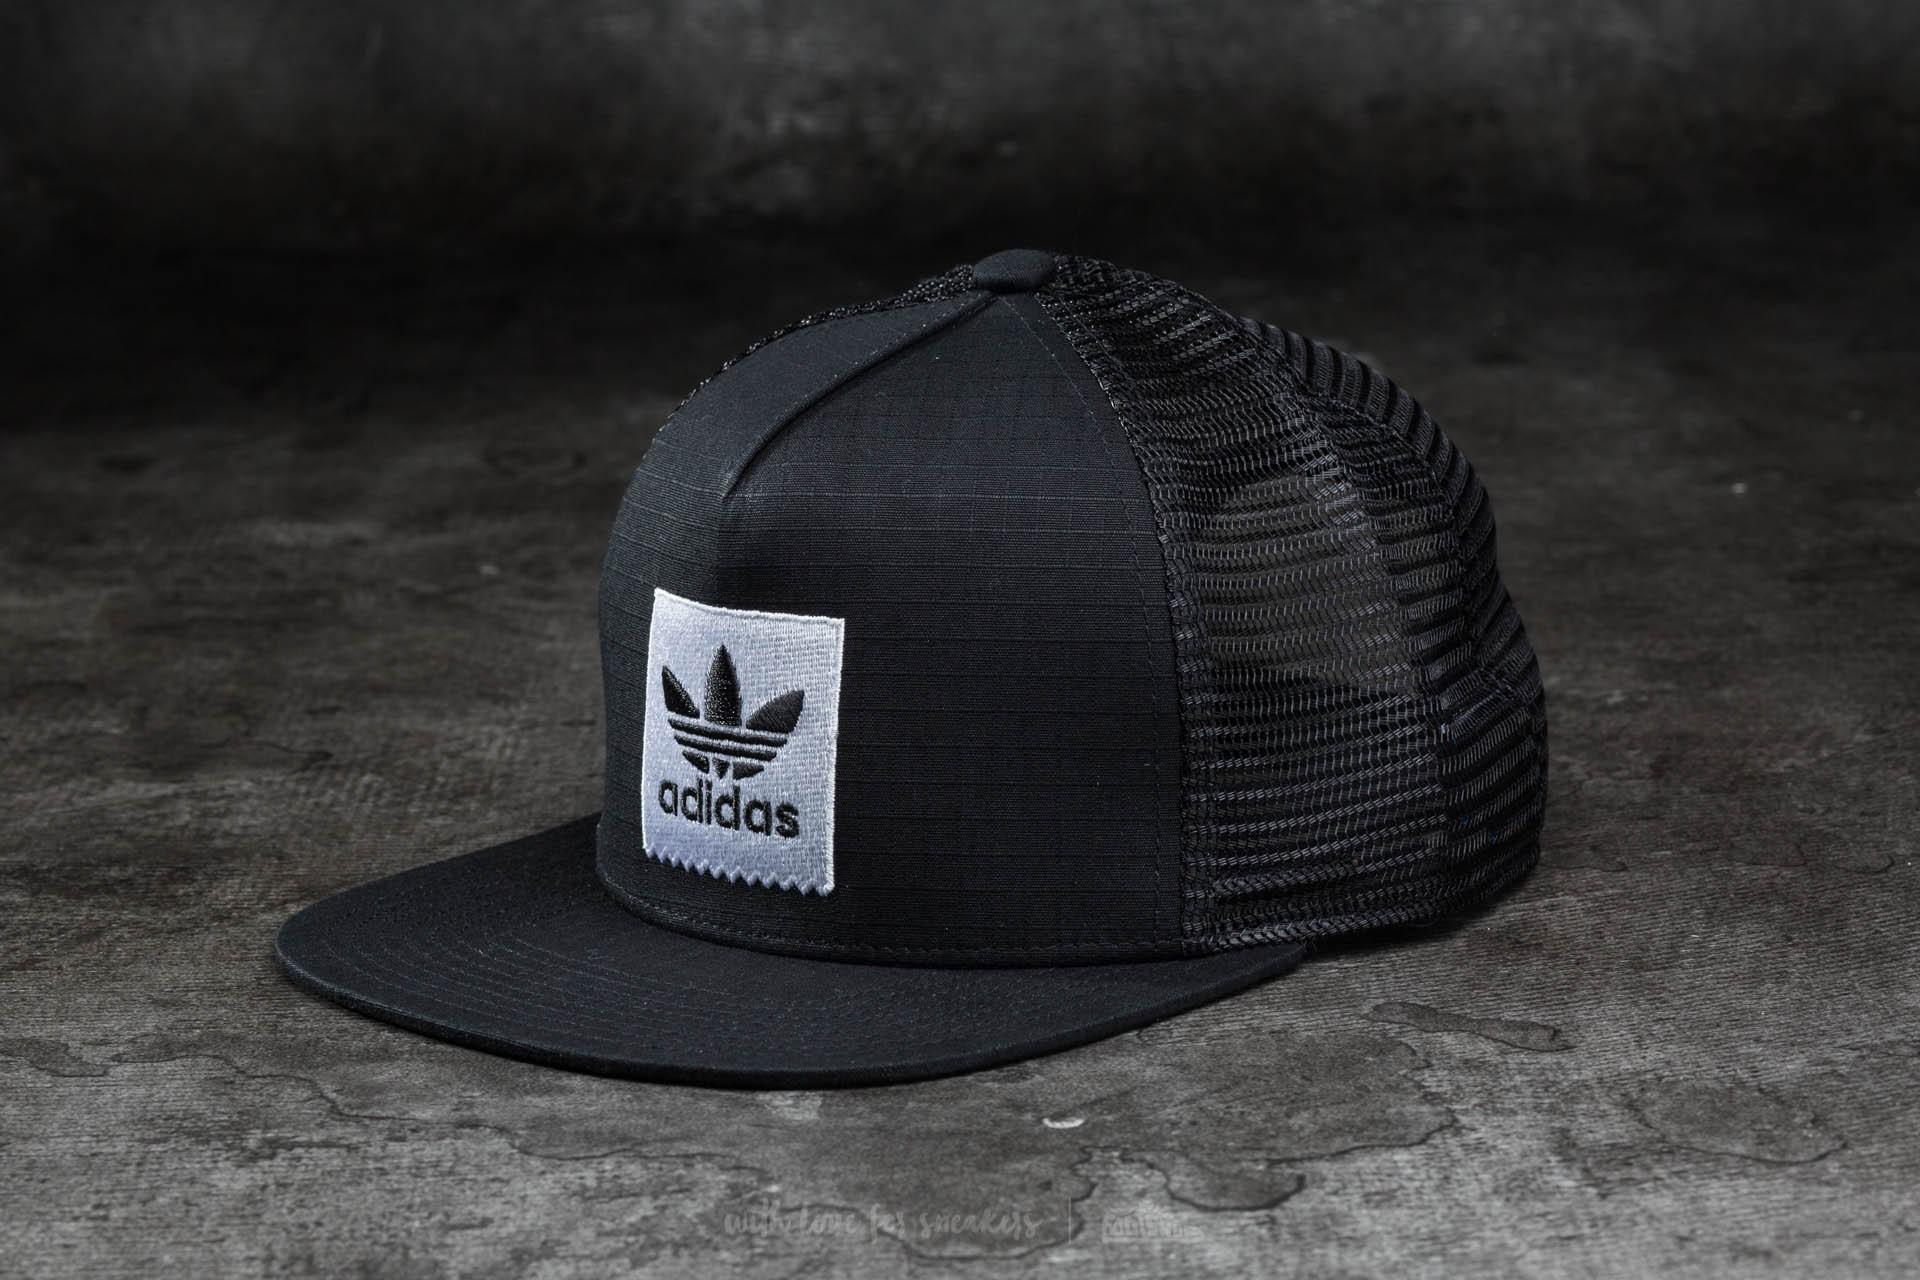 adidas Trucker Hat 1 Black  5387d3ec37dc